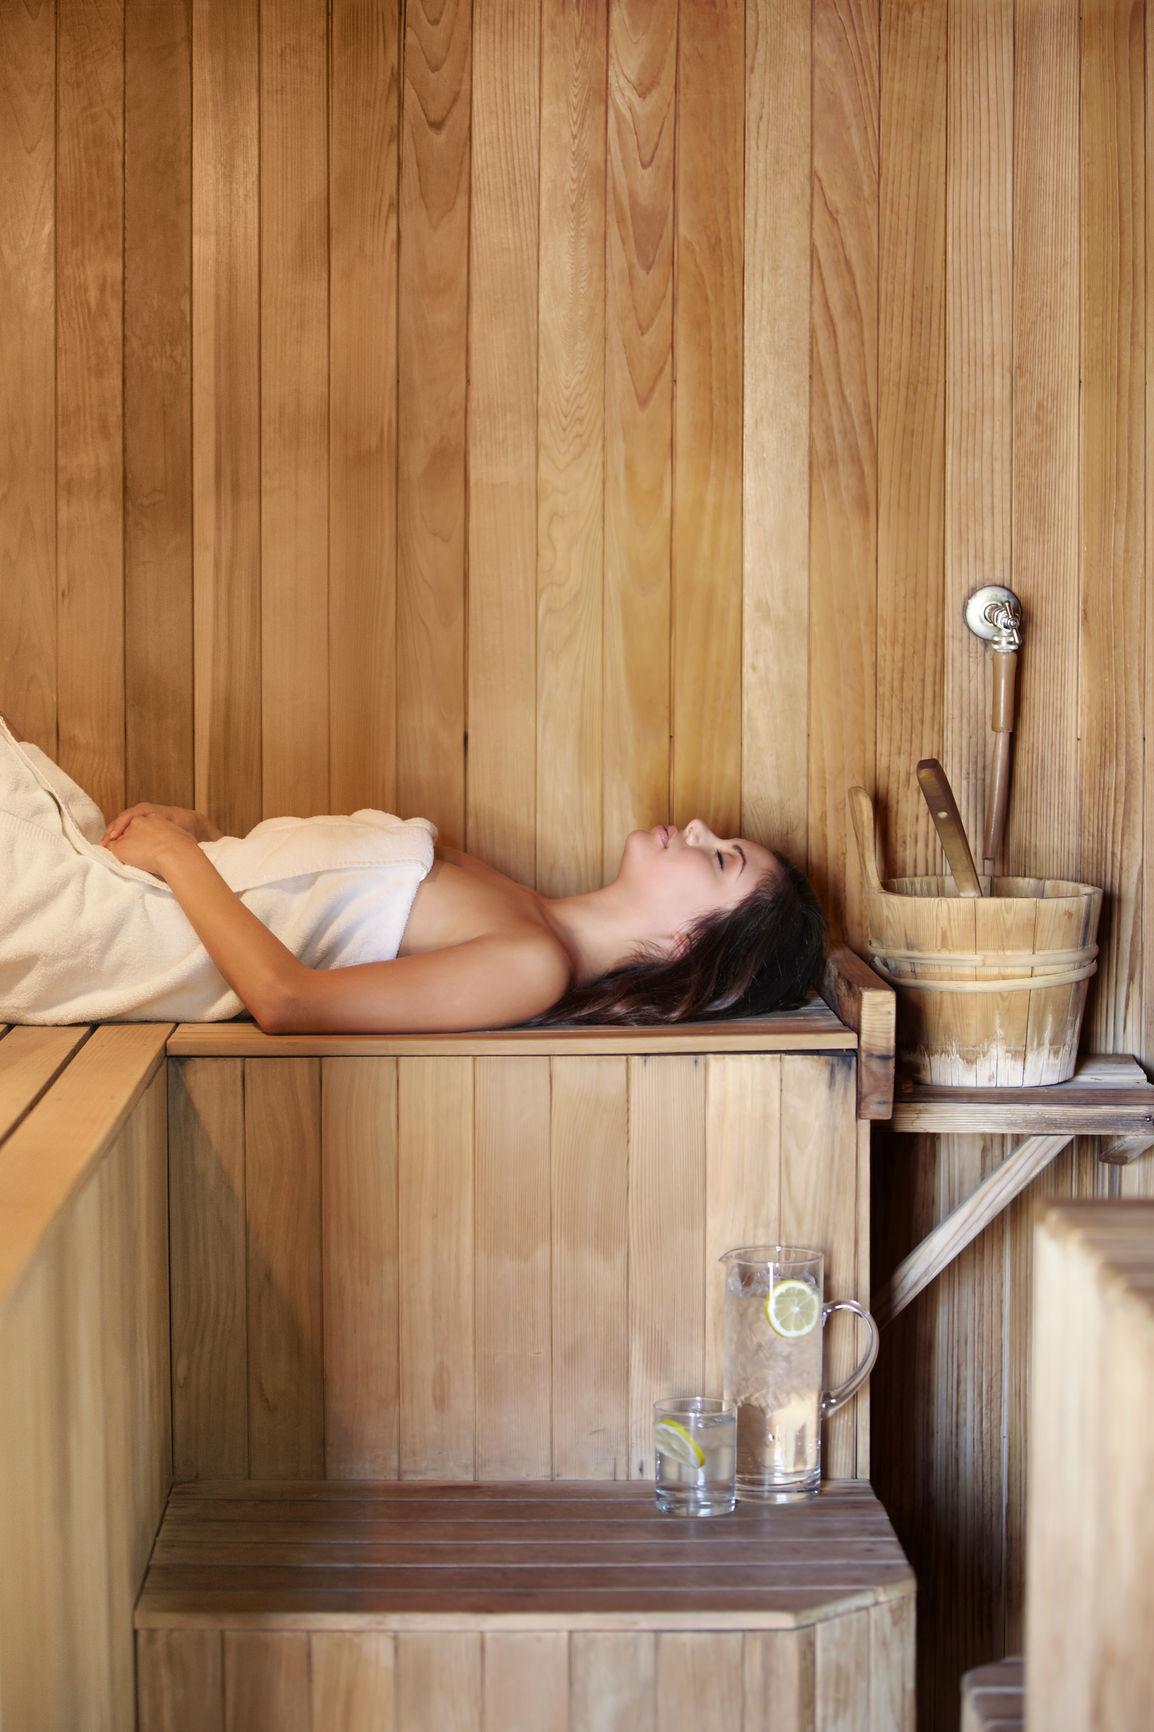 B3 Infrared Sauna - A DETOXIFICATION EXPERIENCE